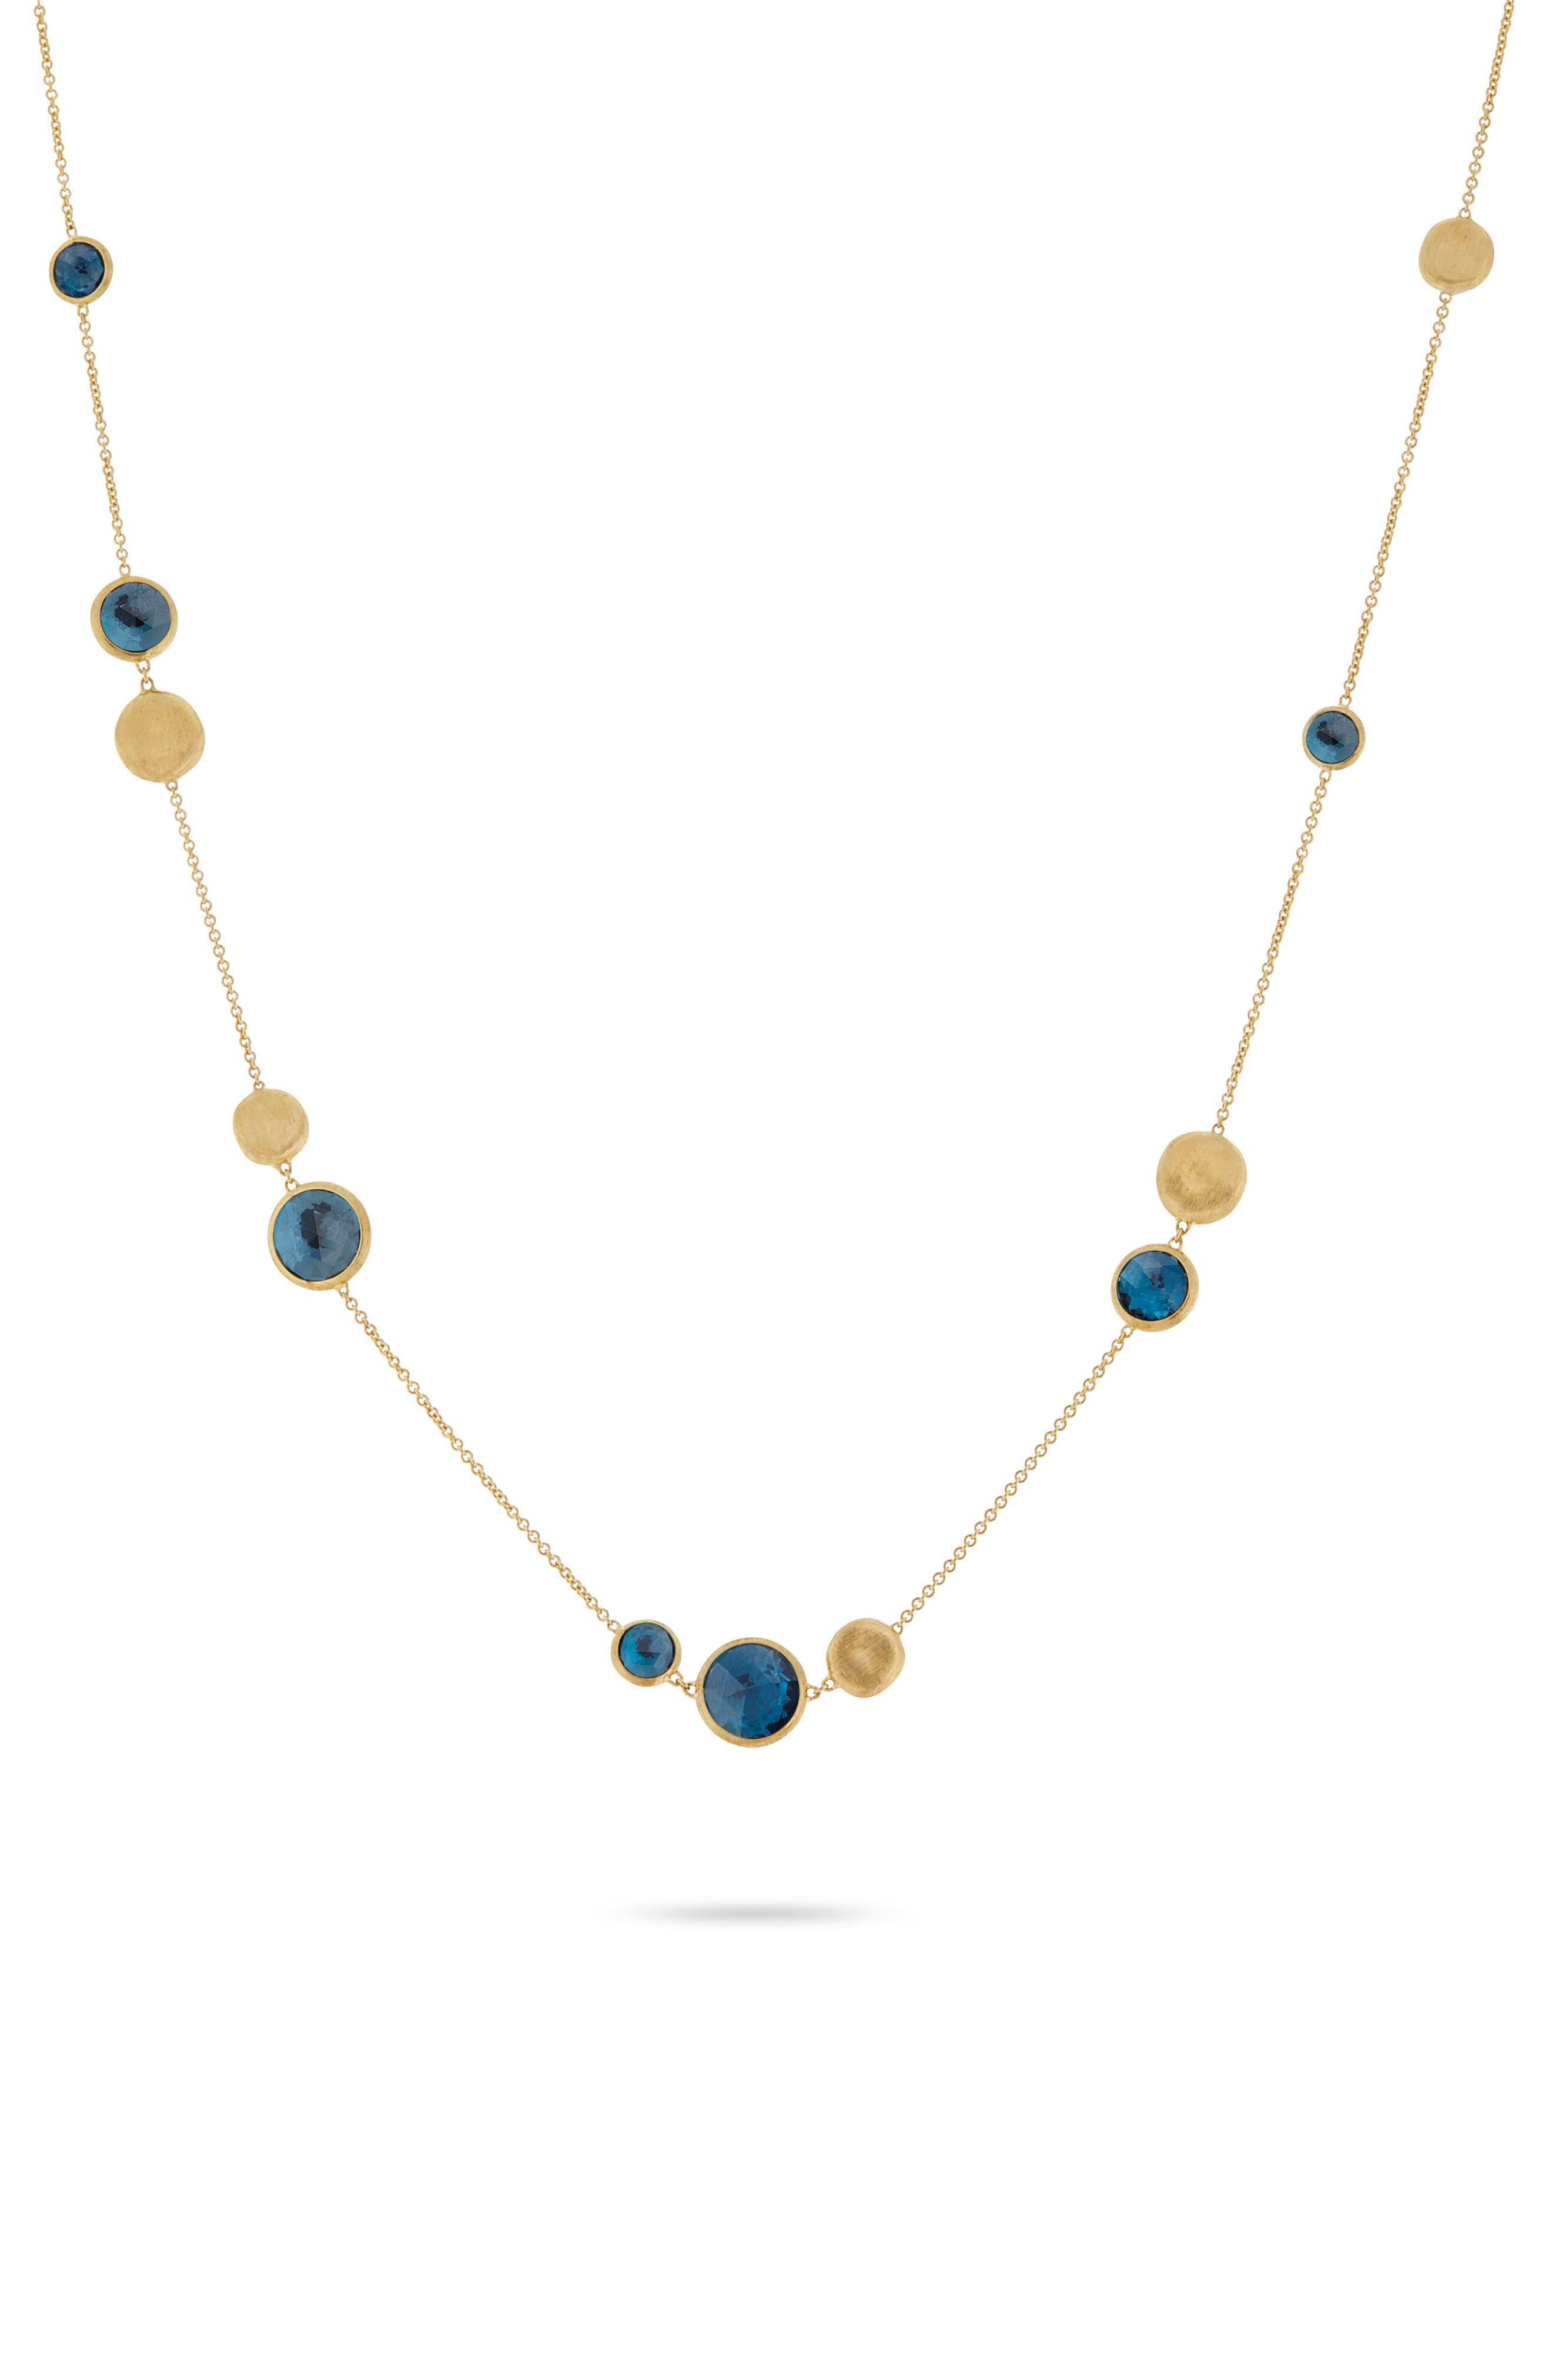 Marco Biecego Jaipur Semiprecious Stone Necklace,                             Main thumbnail 1, color,                             YELLOW GOLD/ BLUE TOPAZ